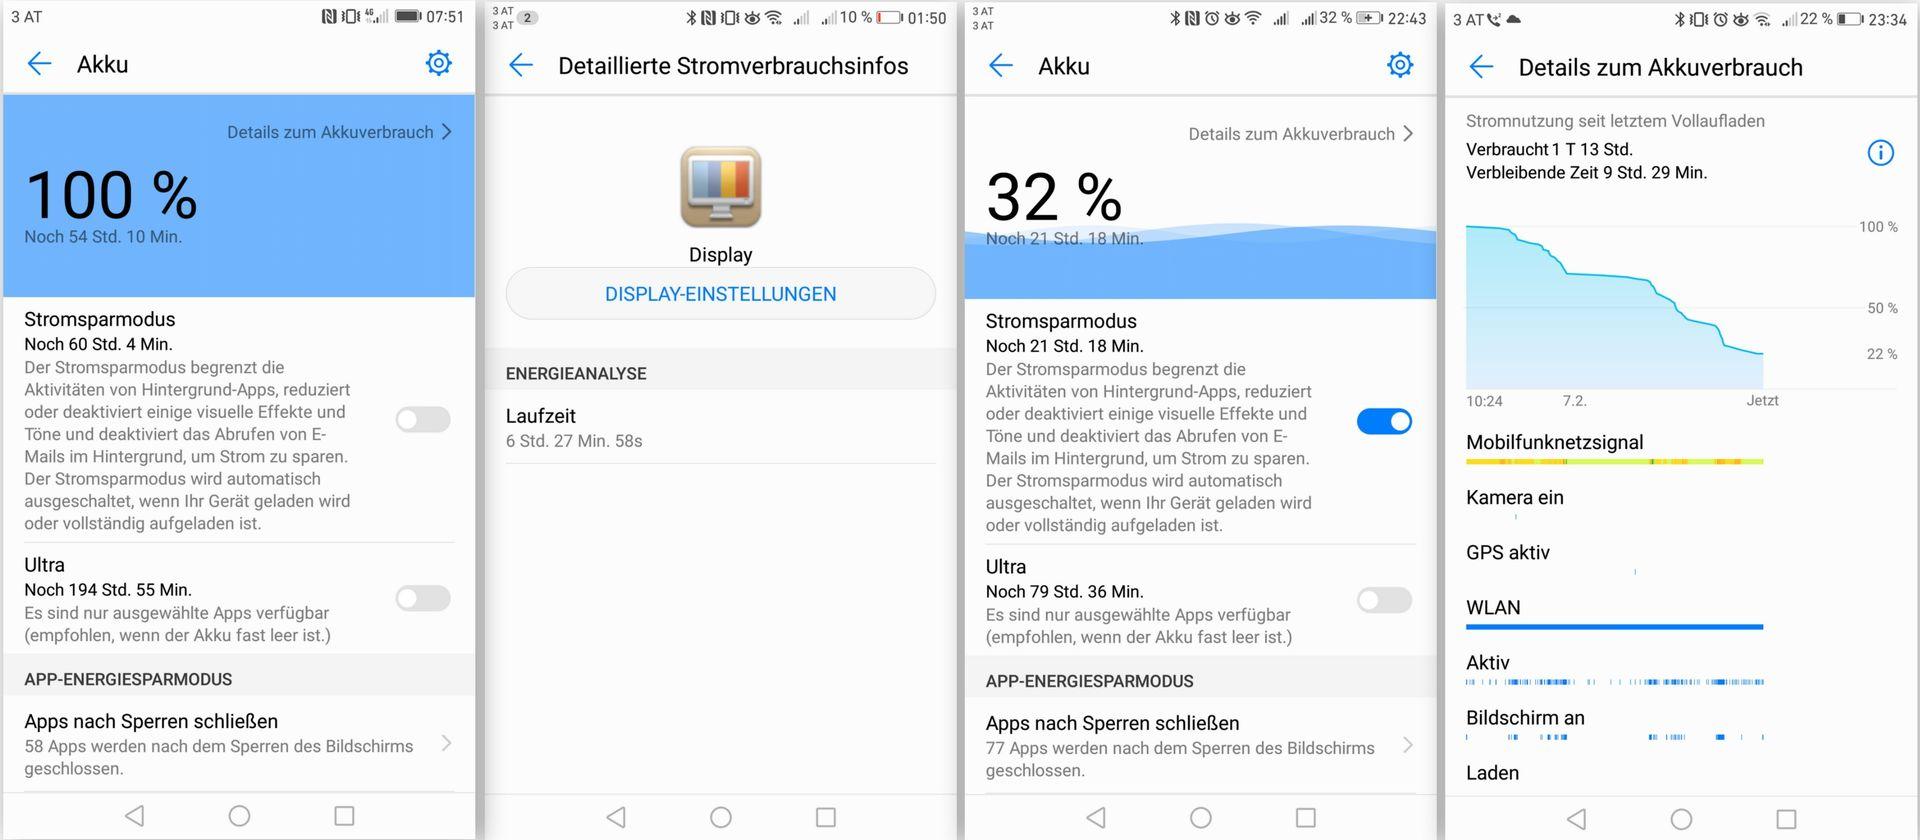 Akku Power - Huawei Mate 9 - SmartTechNews